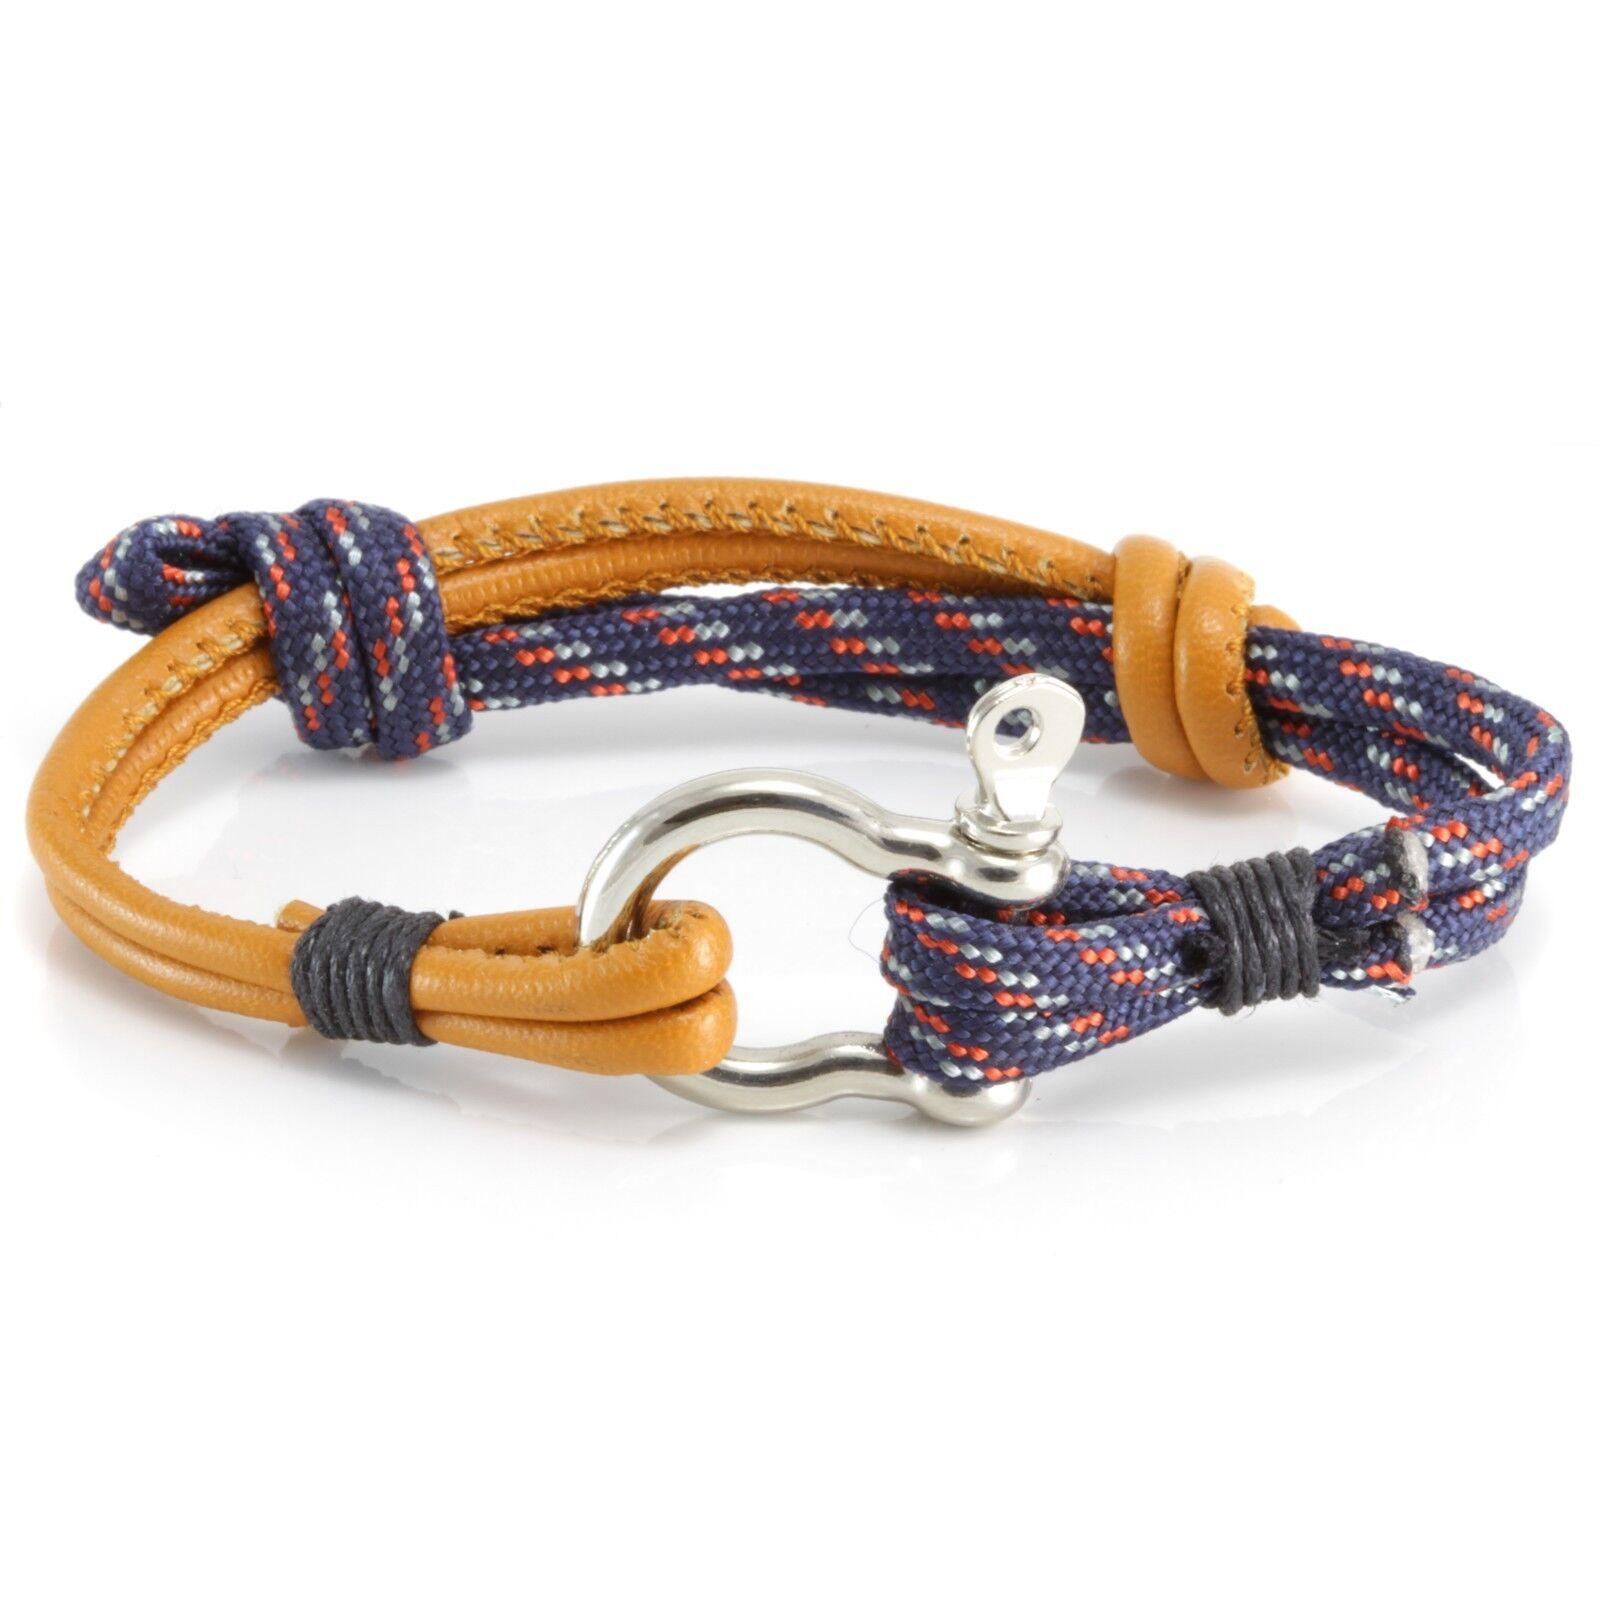 8724166467da5 Details about Mens Adjustable Blue Orange Cord Sailor Rope Knot Anchor Wrap  Wristband Bracelet